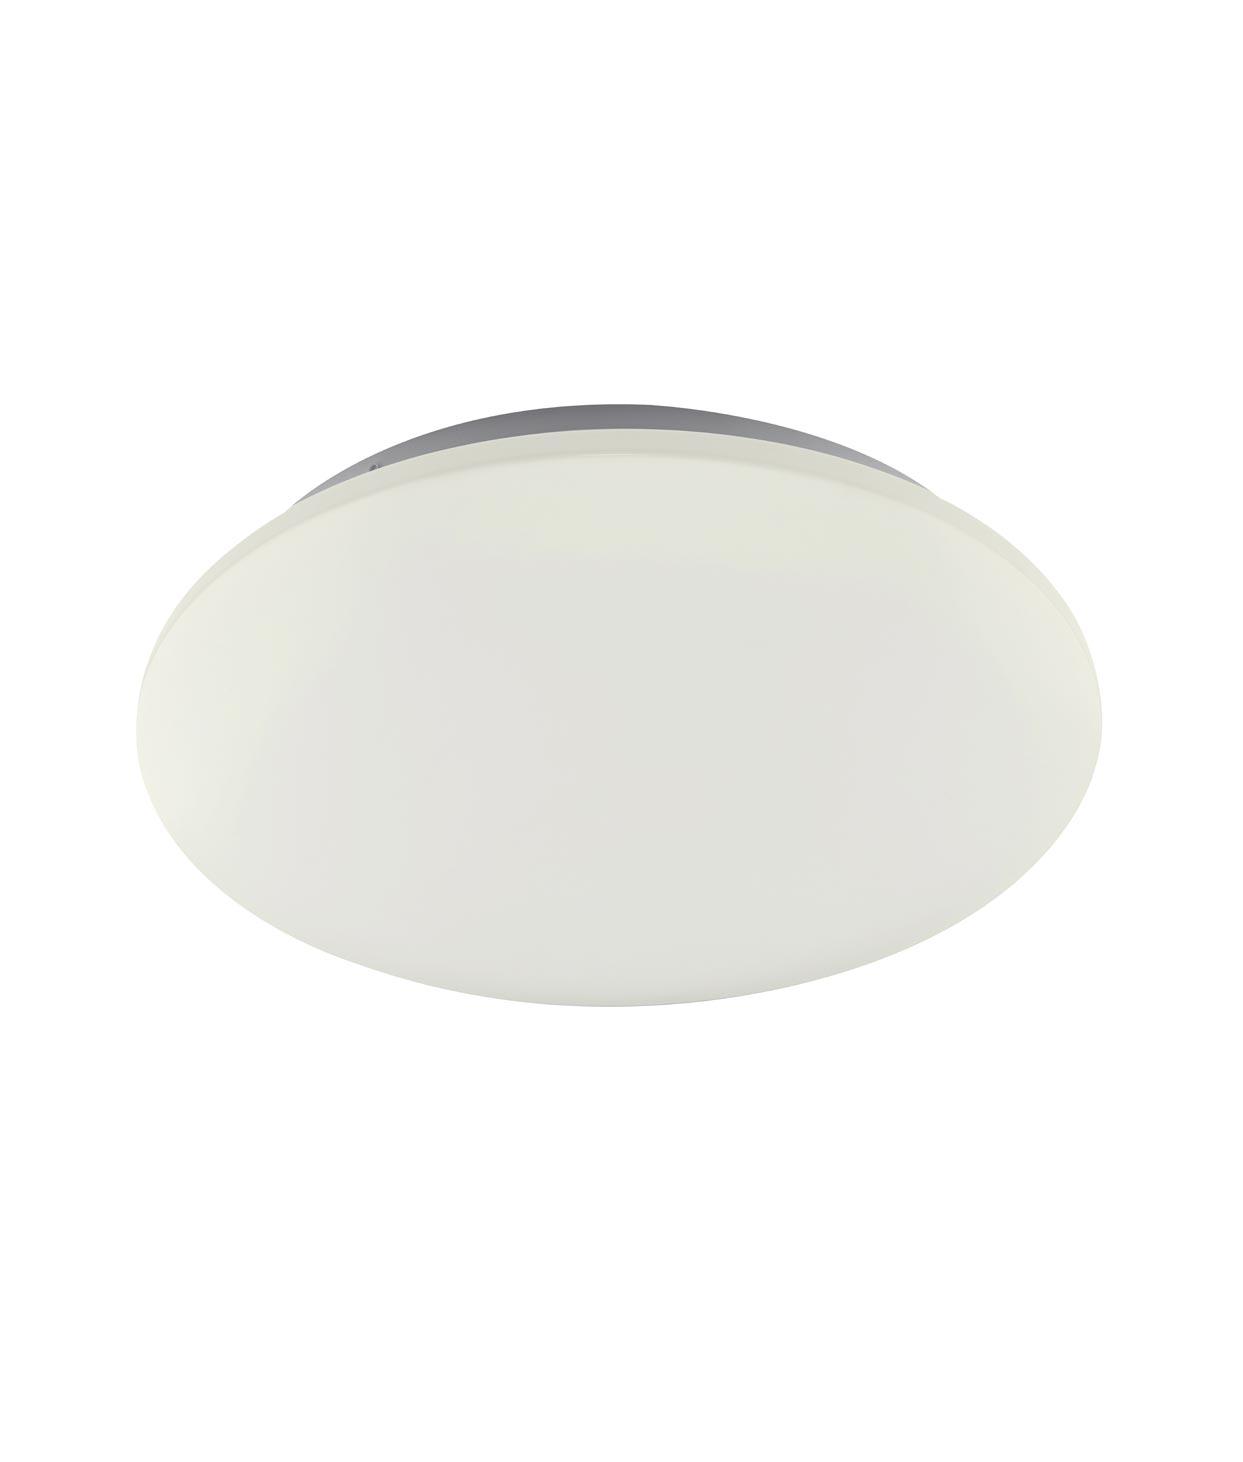 Plafón grande luz cálida LED ZERO II